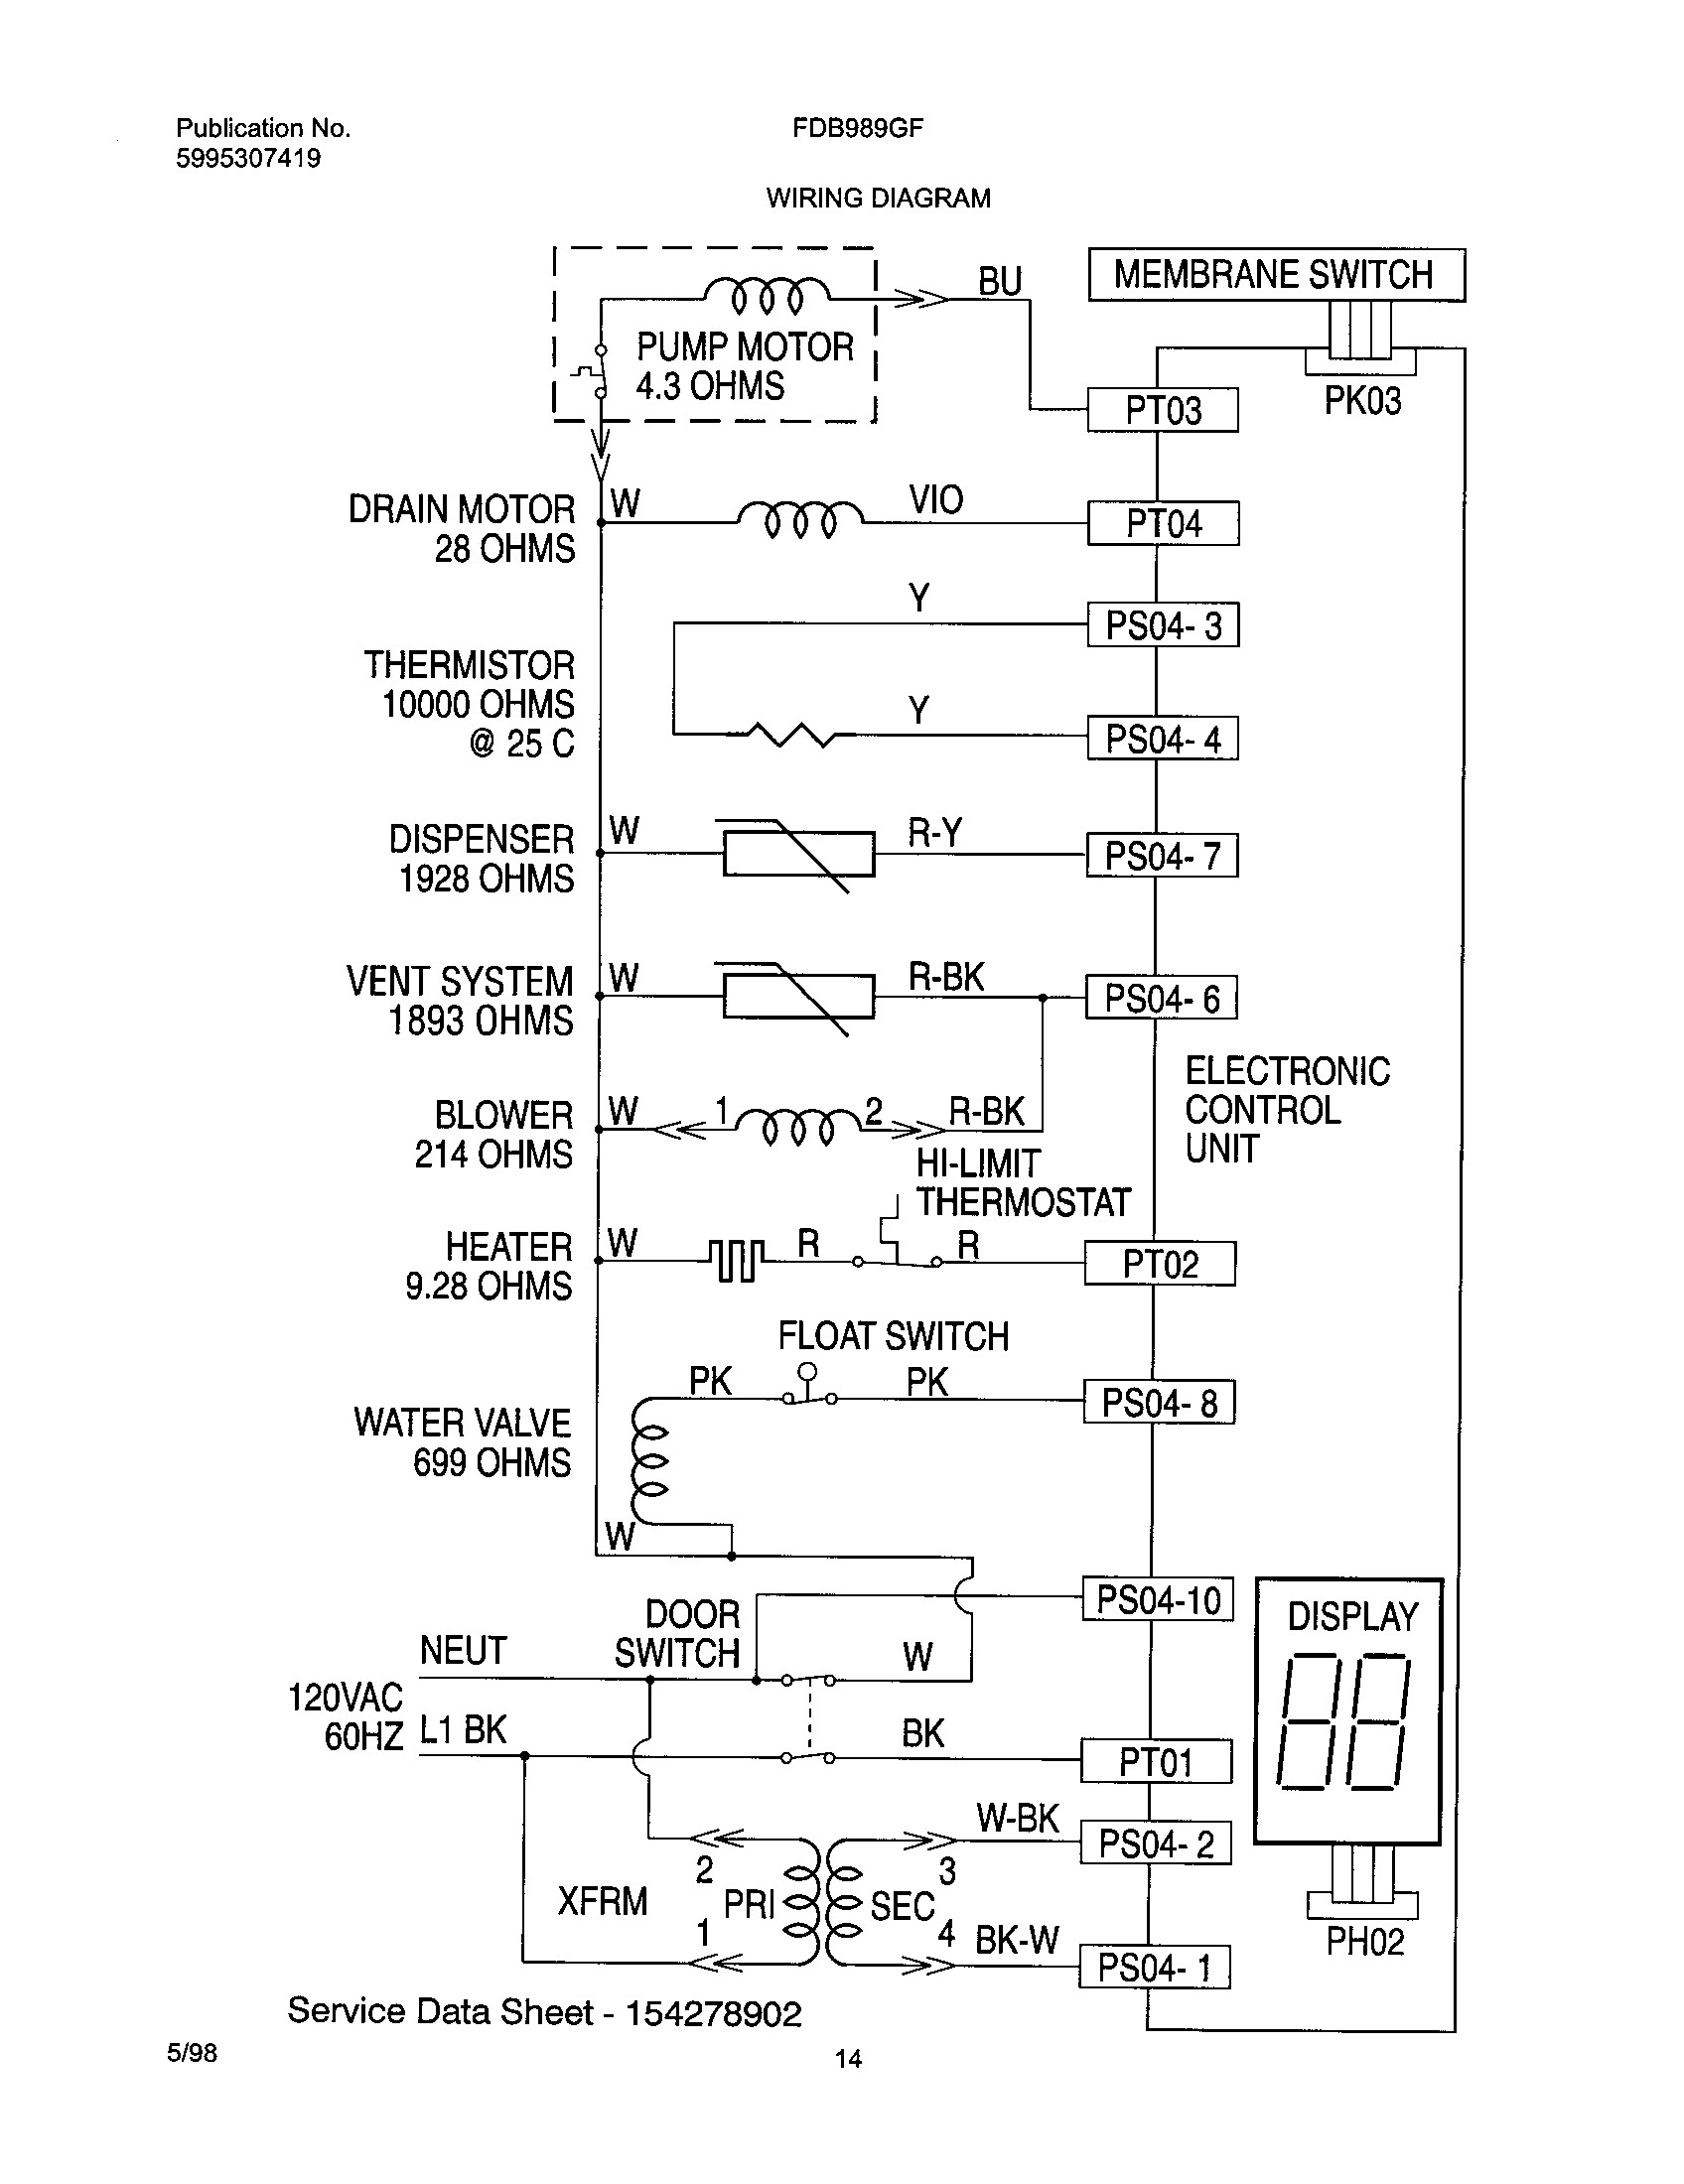 Frigidaire Gallery Dishwasher Parts Diagram Wiring Diagram Parts to Frigidaire B2network Of Frigidaire Gallery Dishwasher Parts Diagram